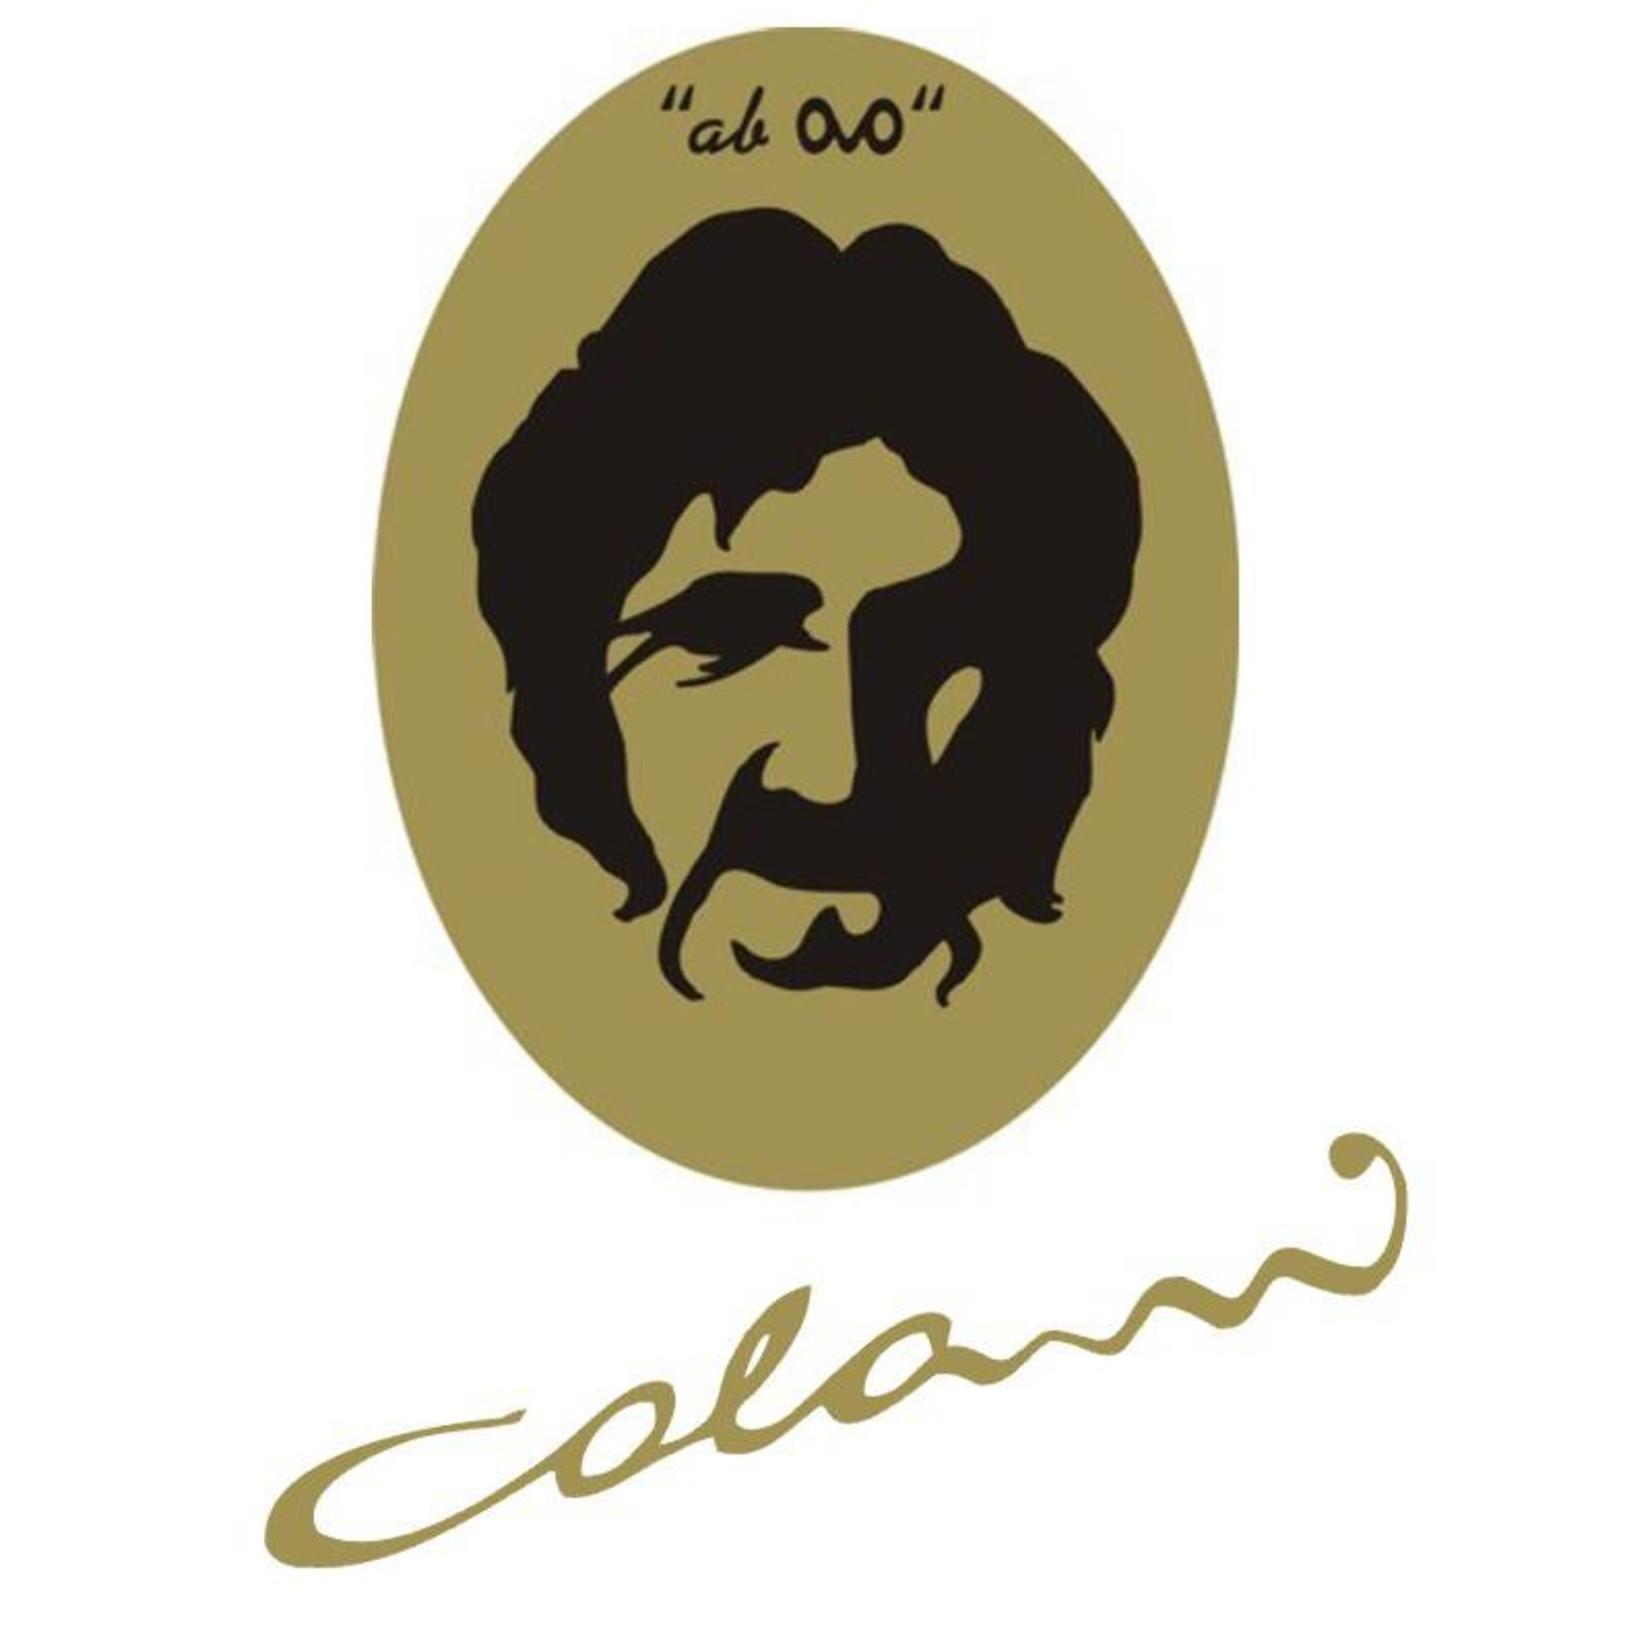 Colani Porzellanserie Colani Jumbotasse   Tasse inkl. Unterteller   gold-schwarz